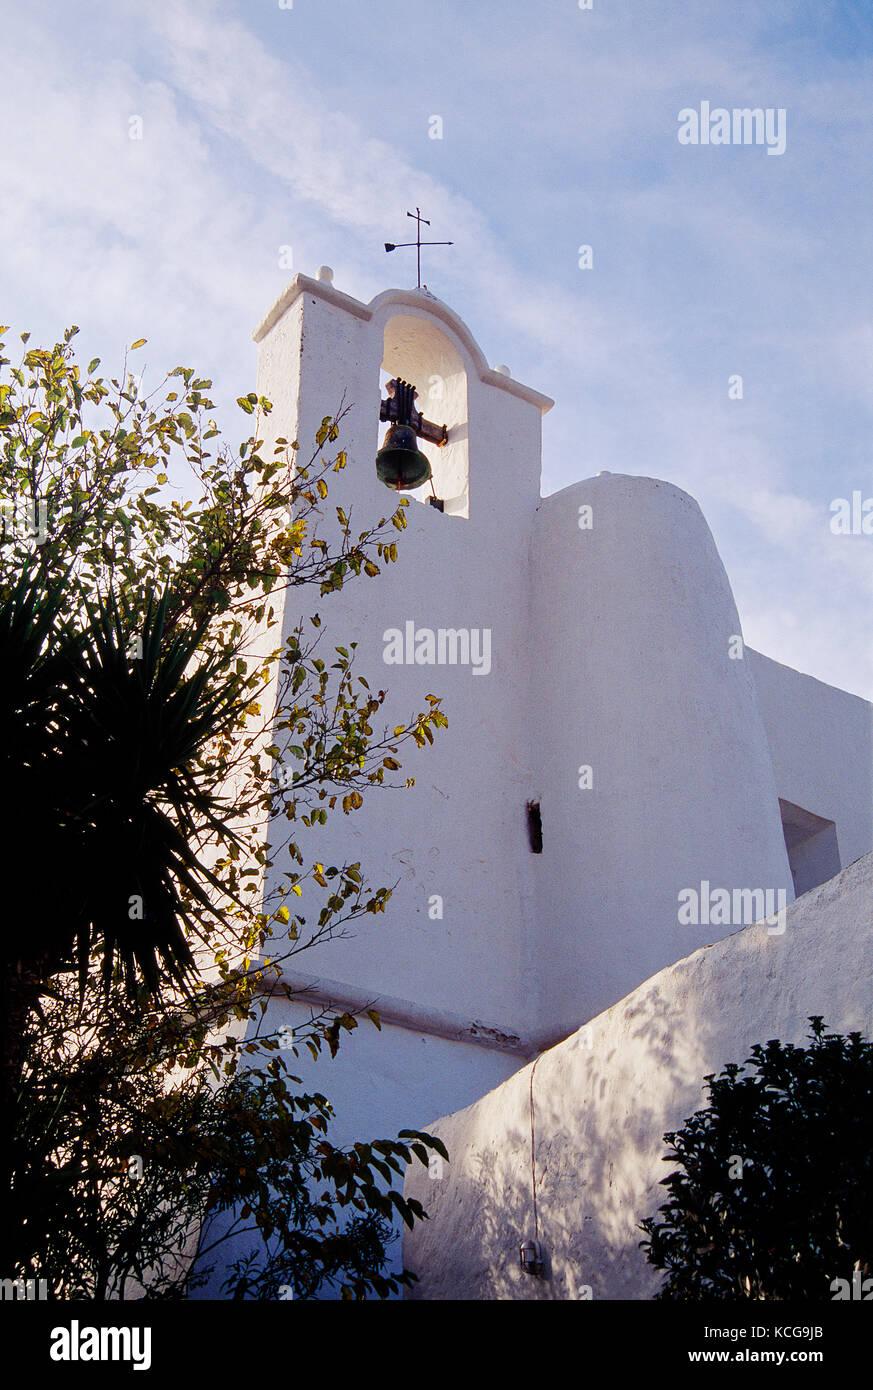 Church. Puig de MIssa, Santa Eularia des Riu, Ibiza island, Balearic Islands, Spain. - Stock Image